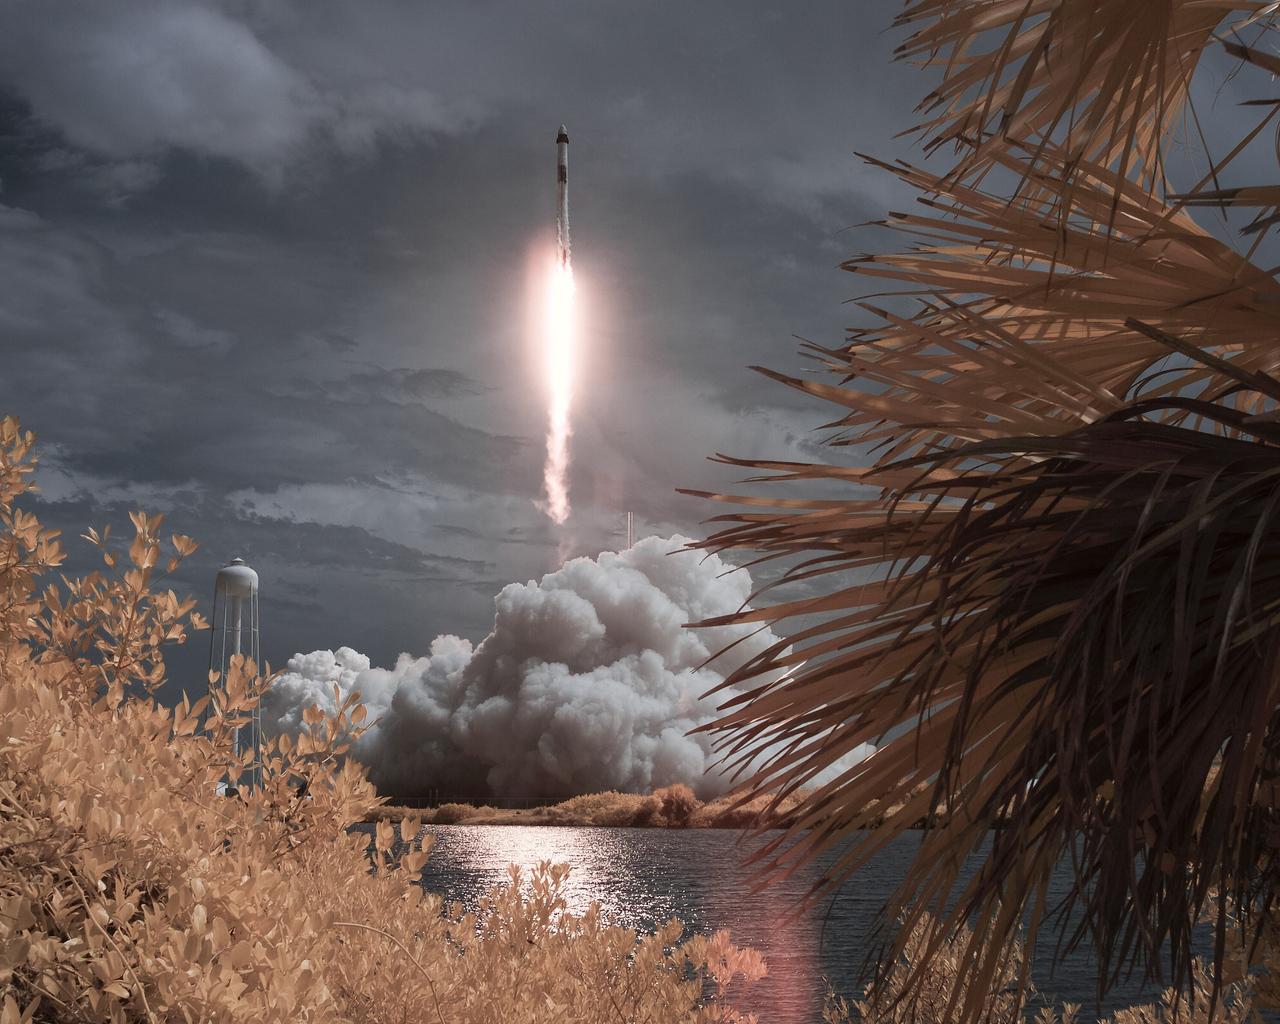 spacex-falcon-9-rocket-crew-dragon-vy.jpg